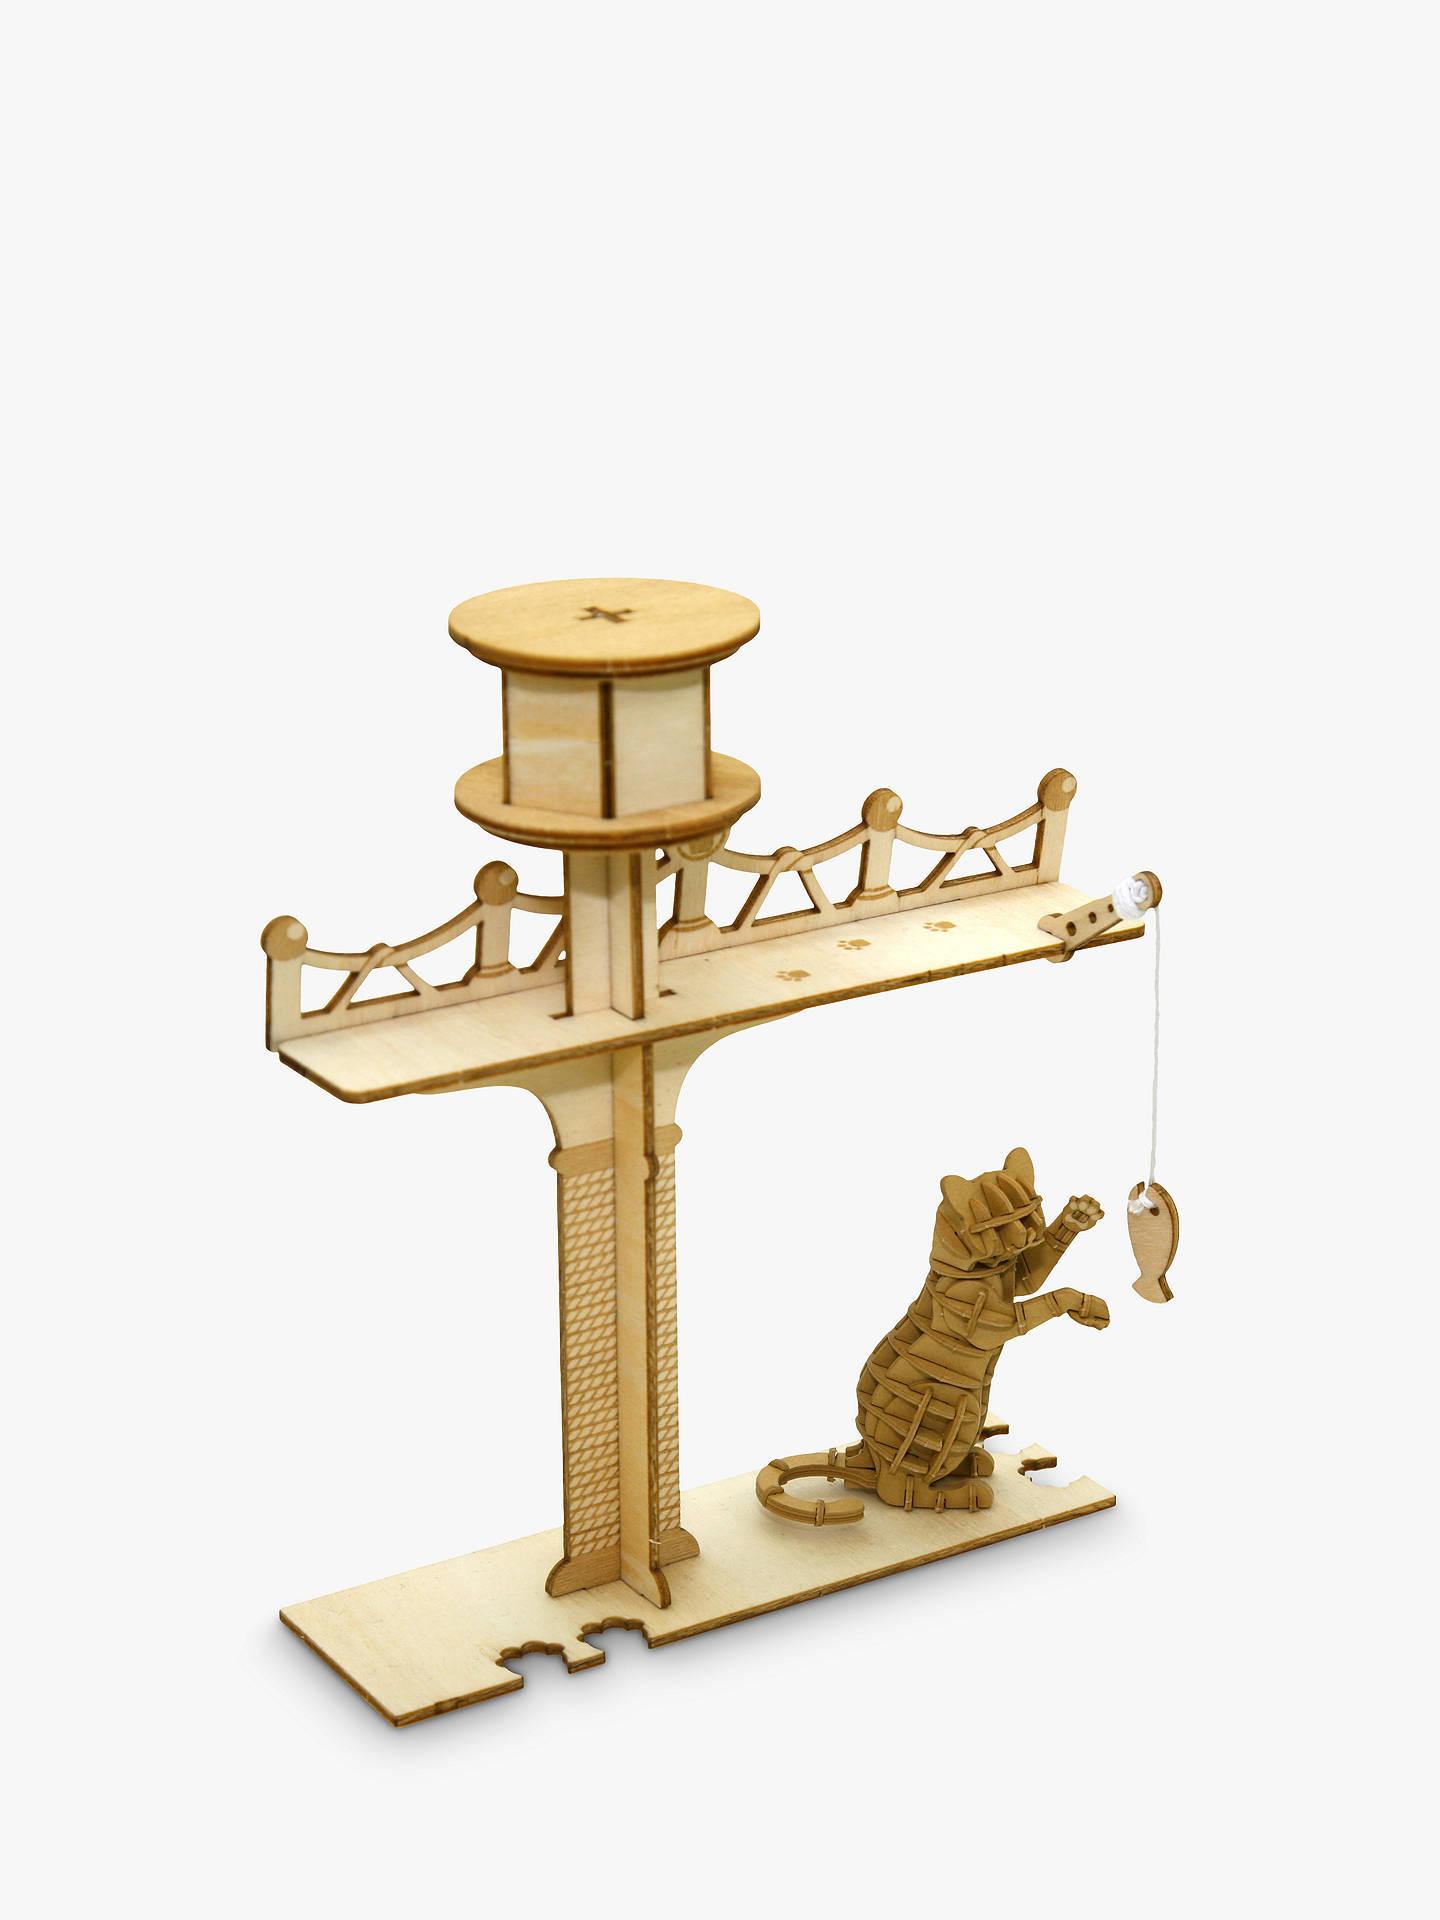 Jigzle Cat Playground 3d Puzzle Kit At John Lewis Partners